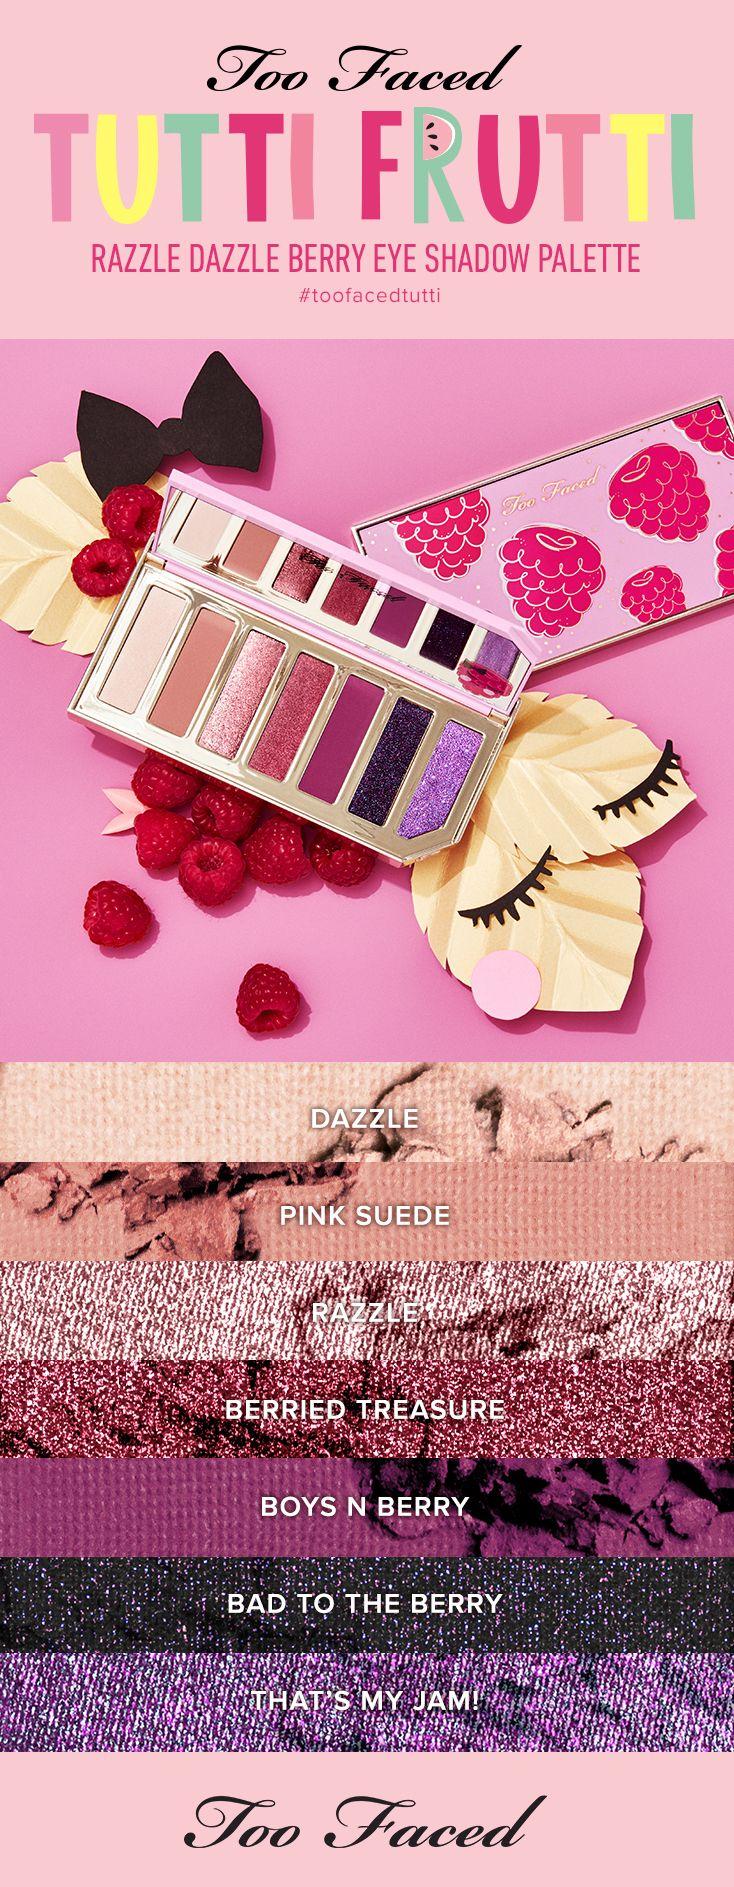 Razzle Dazzle Berry Eye Shadow Palette Beauty Makeup